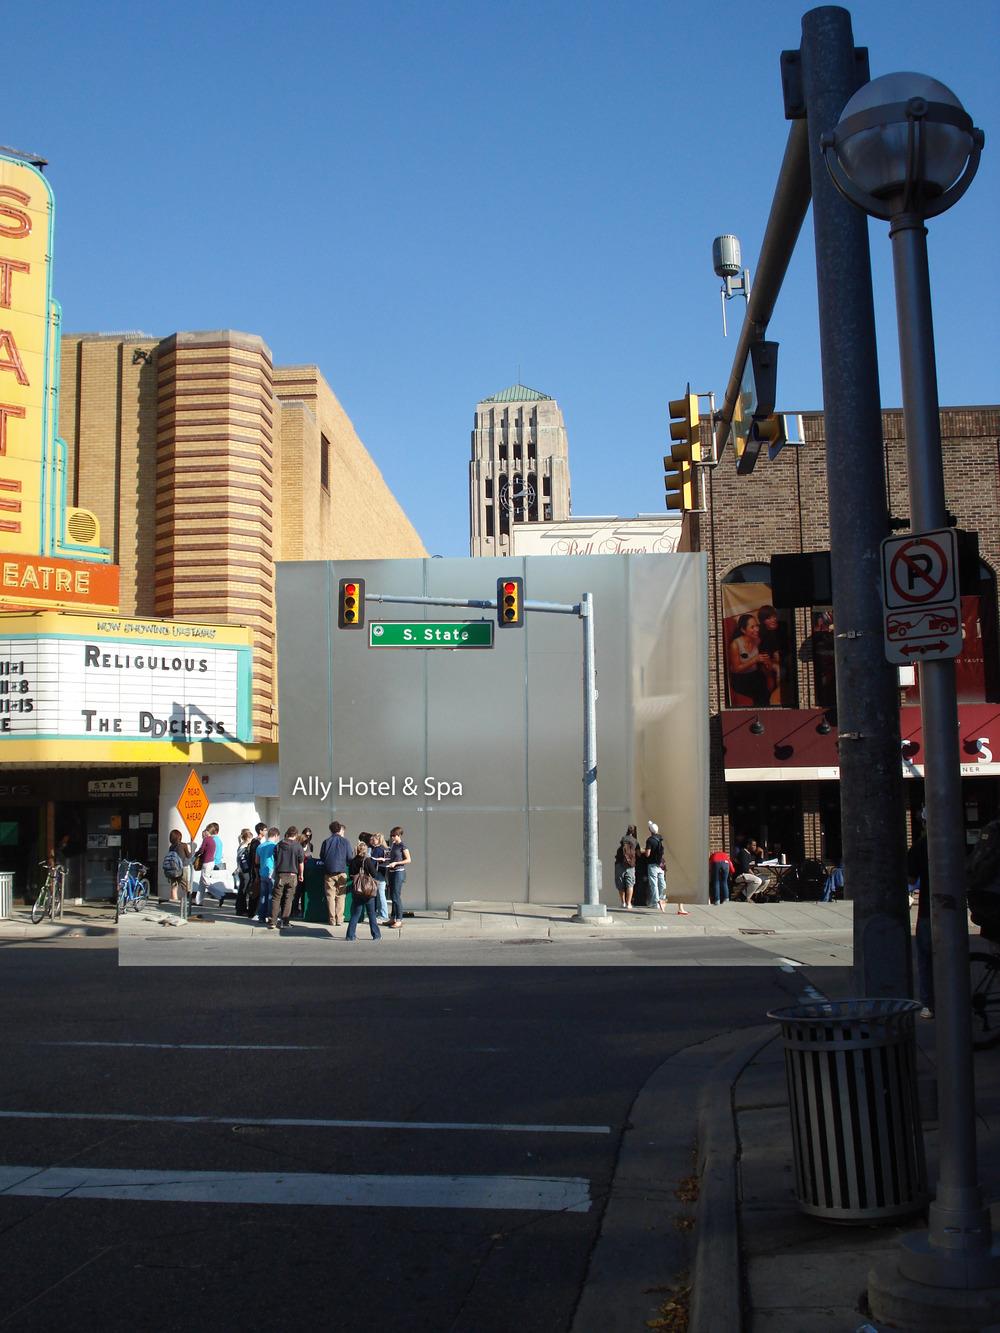 State Street Elevation